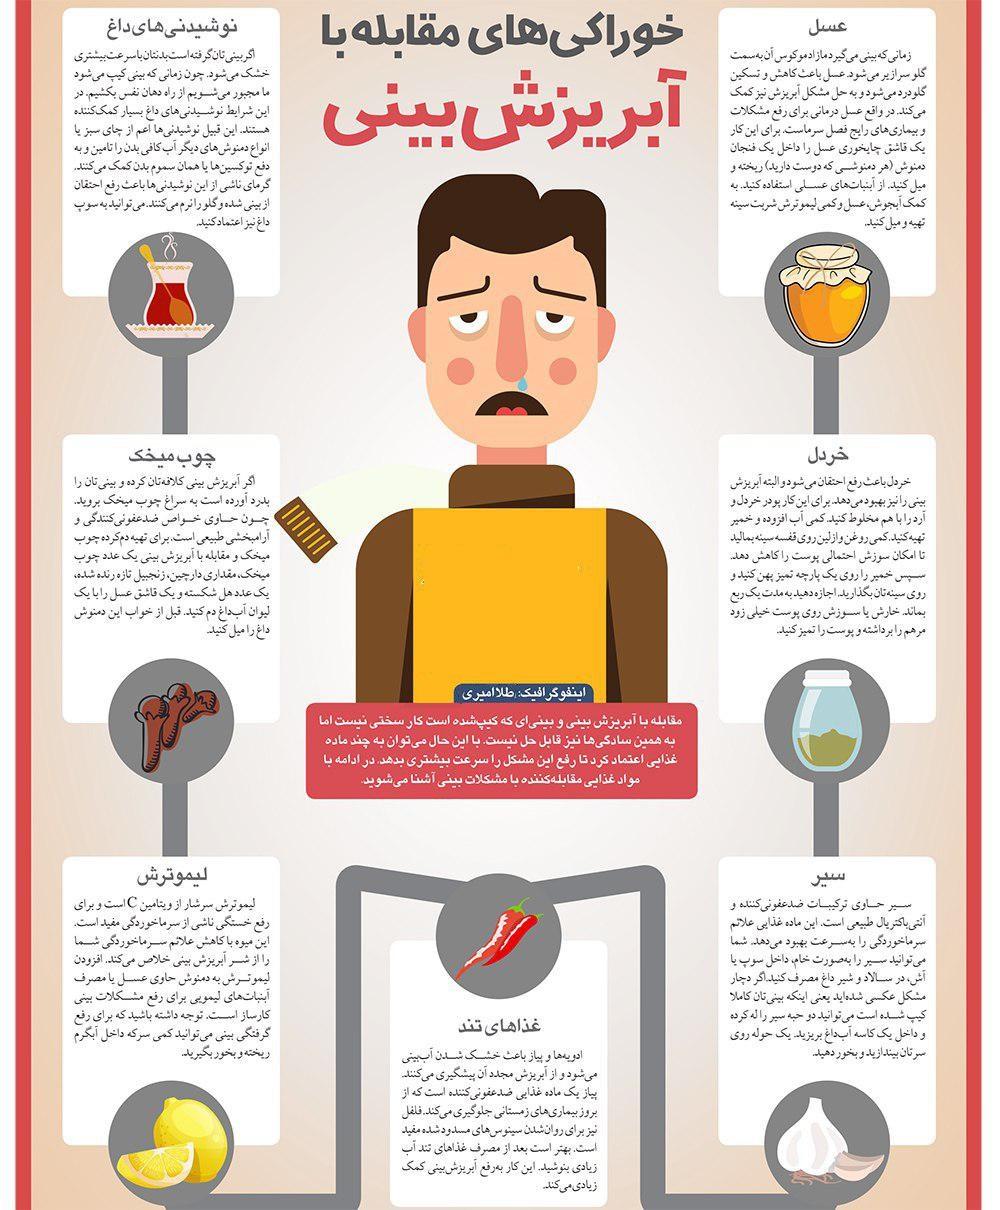 قوي ترين مواد غذايي براي درمان آبريزش بيني + اينفوگرافي